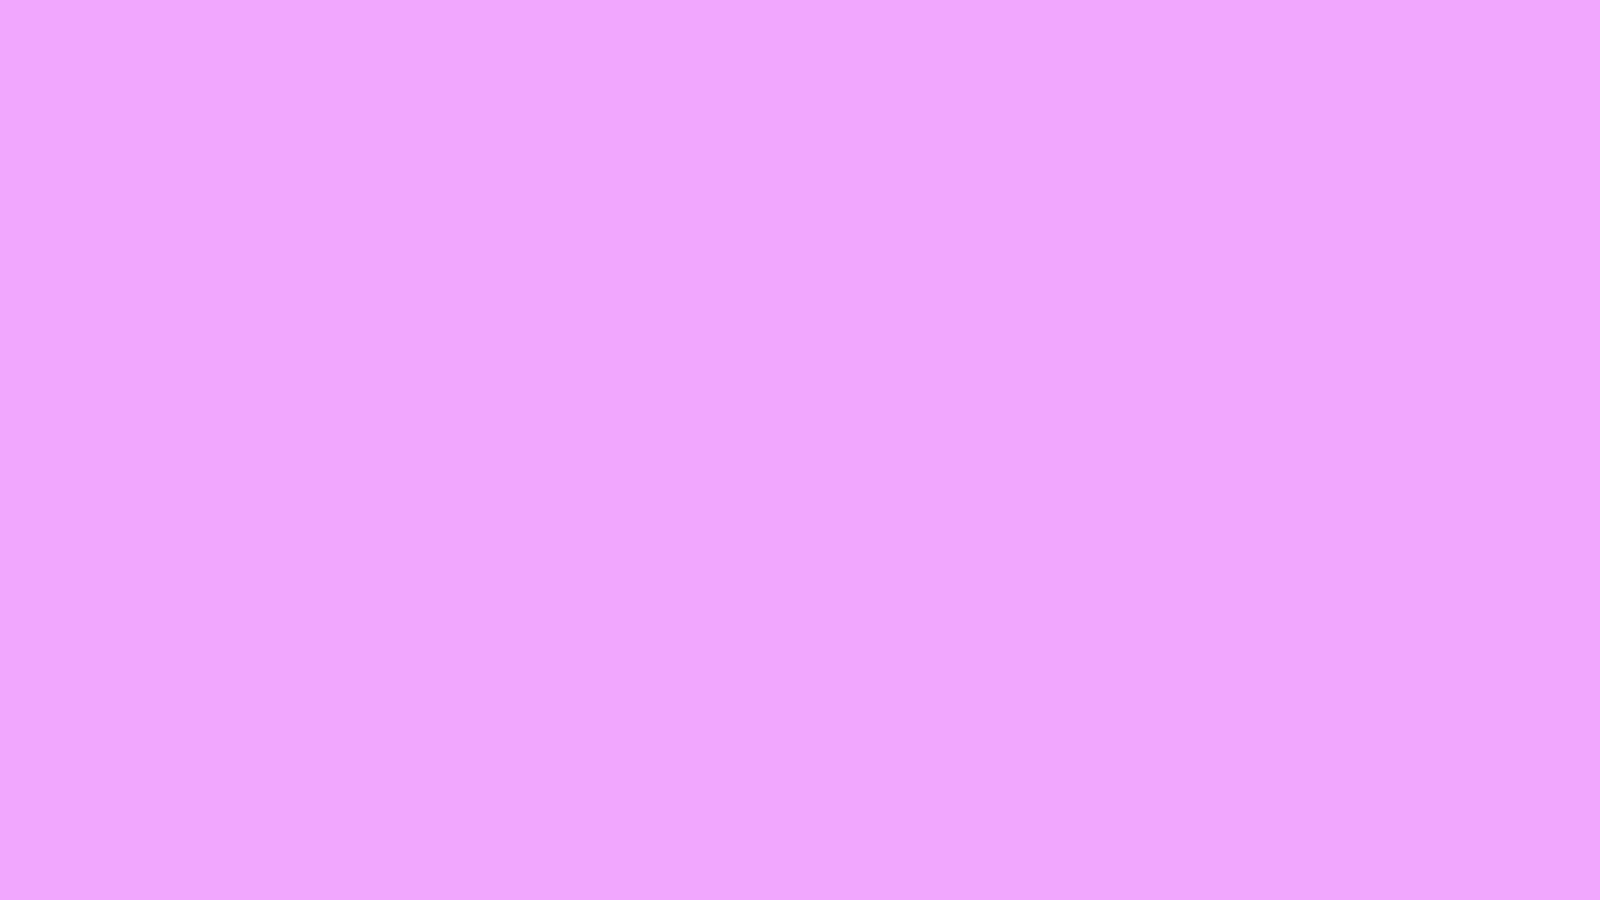 1600x900 Rich Brilliant Lavender Solid Color Background